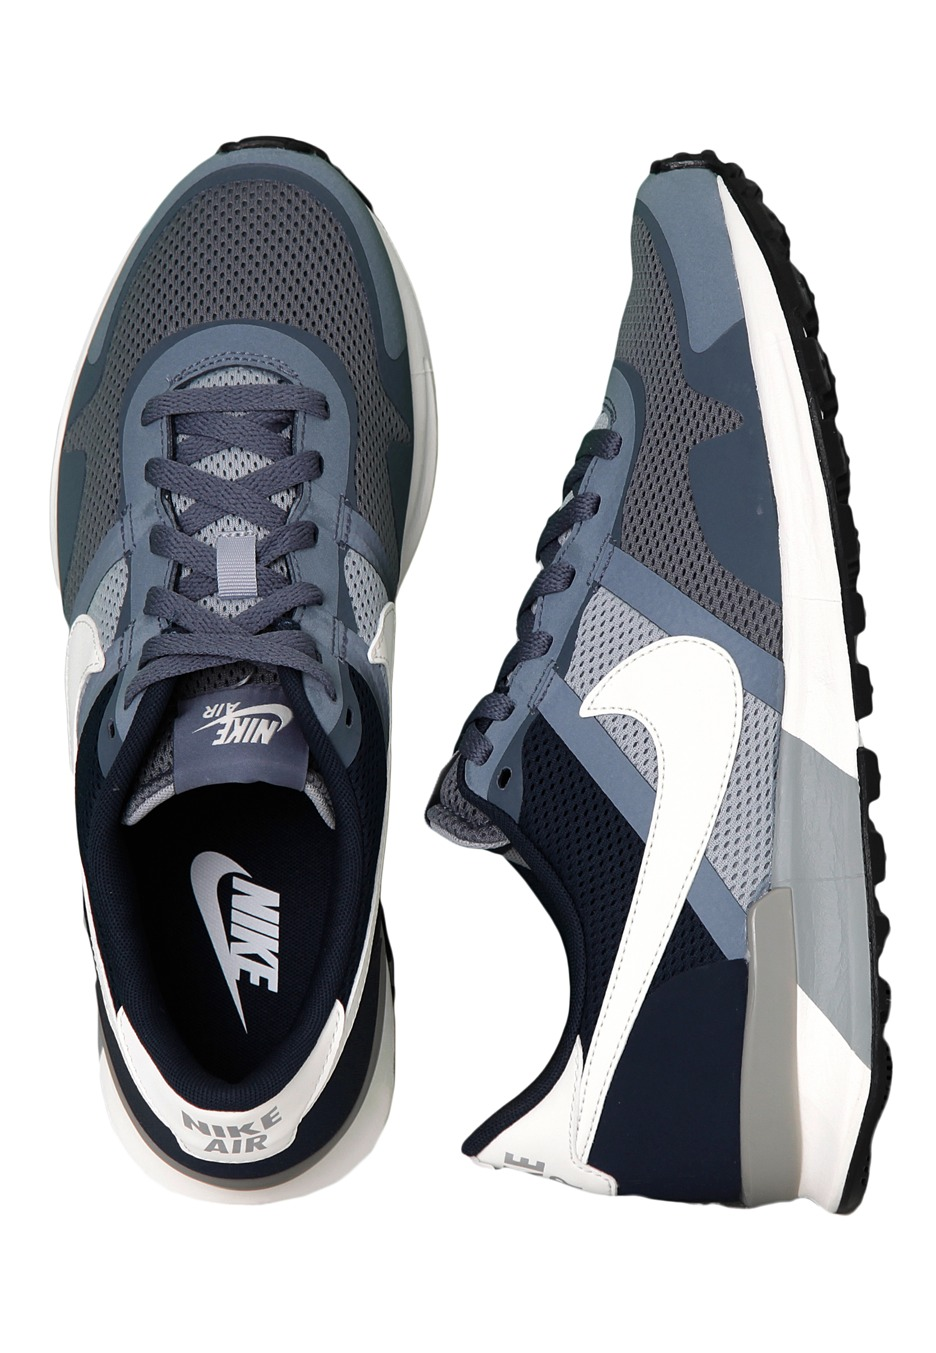 buy online 76e51 8b0f4 Nike - Air Pegasus 8330 Armory SlateSilverNavy - Shoes - Impericon.com UK